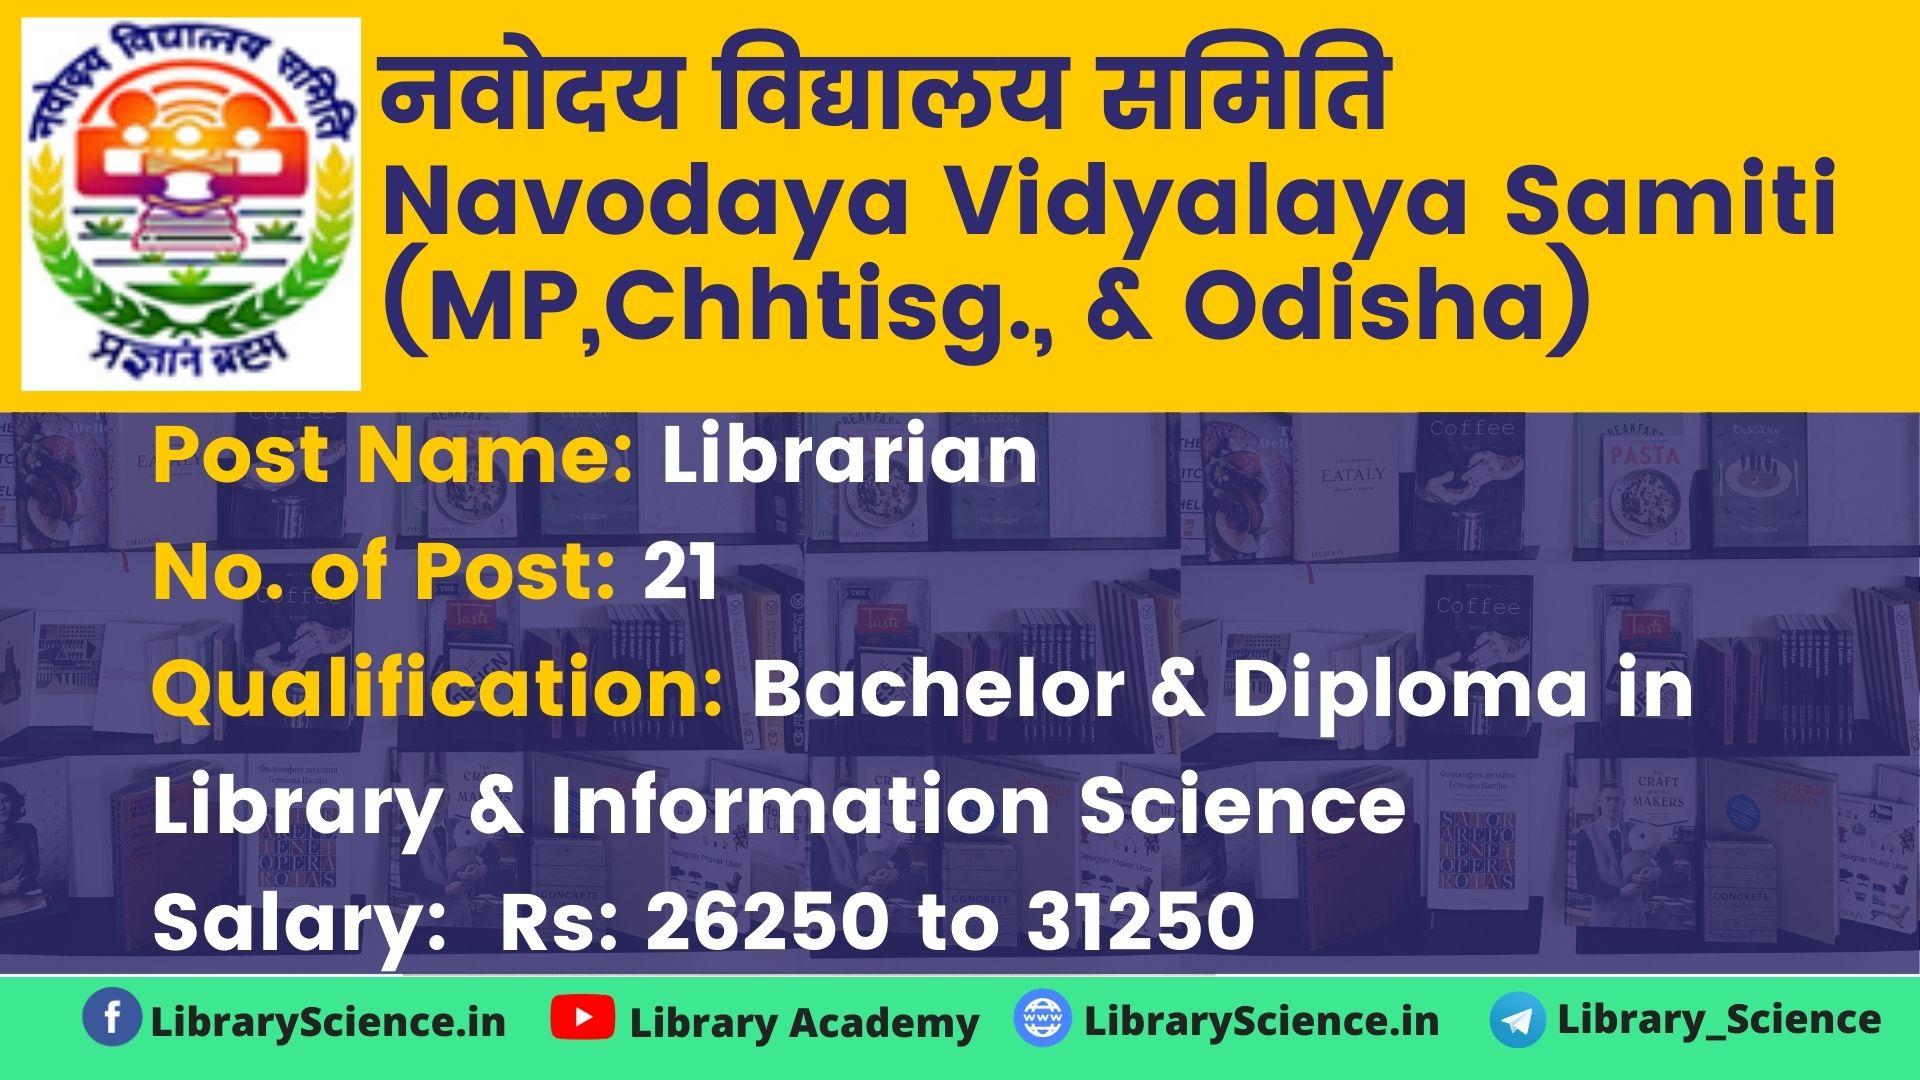 NVS Librarian Vacancy 2020